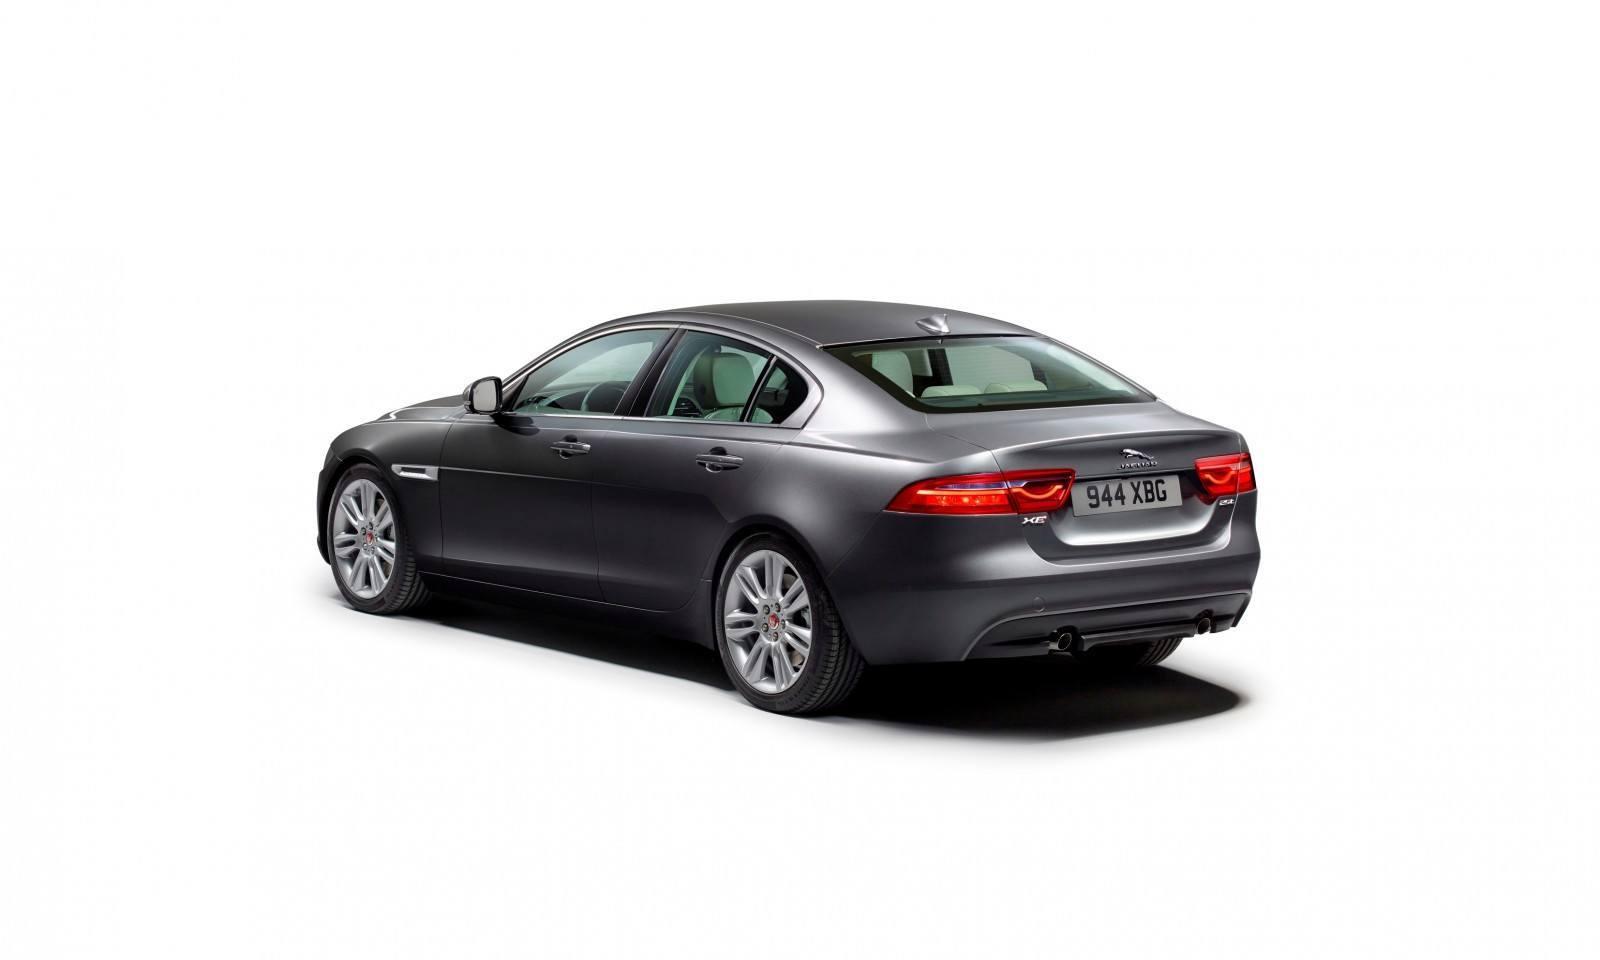 2016 Jaguar XE 16